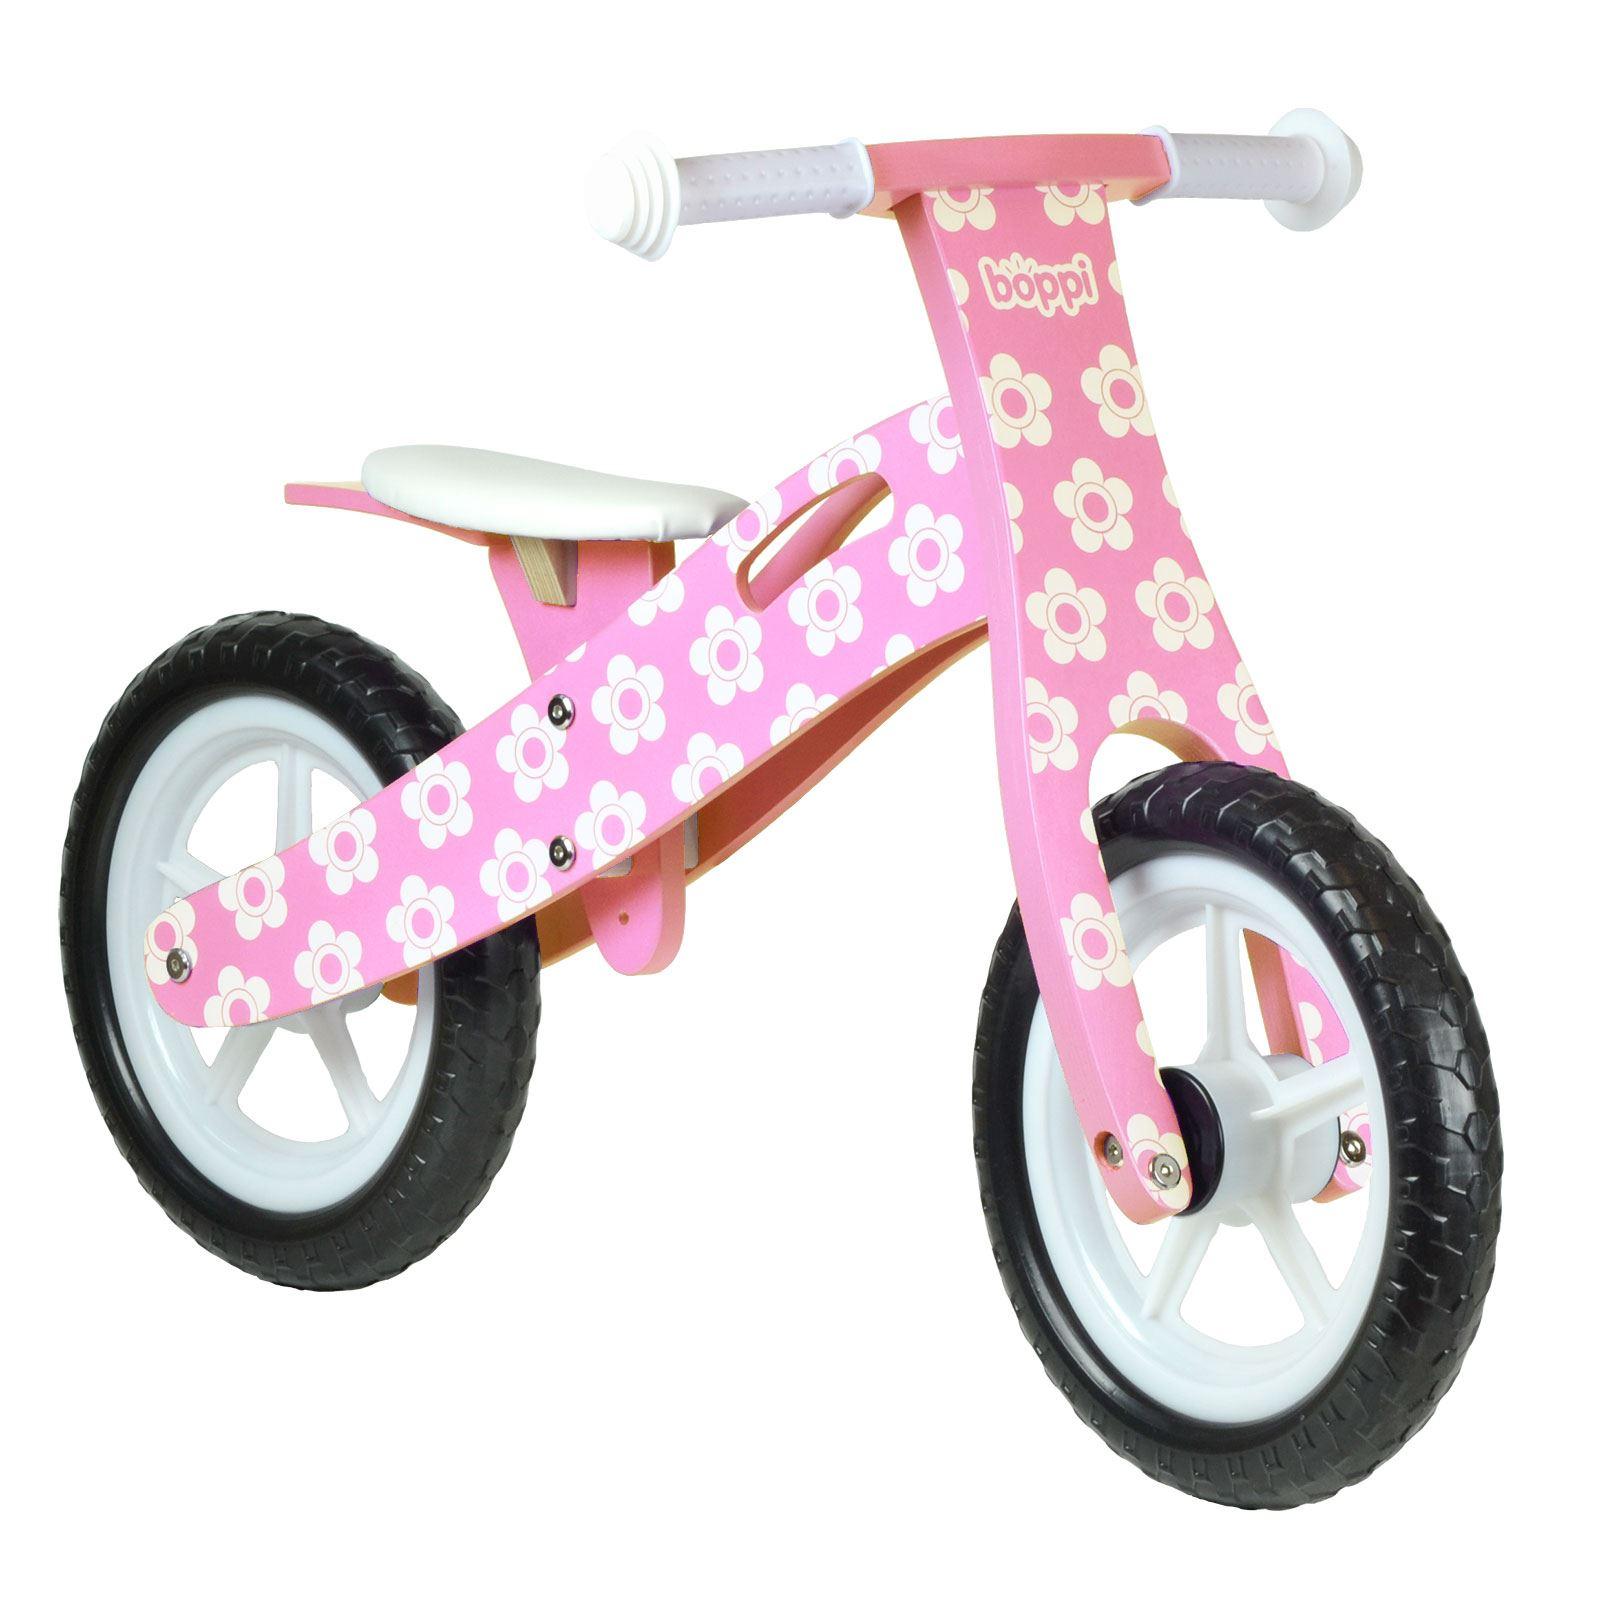 Boppi Children S Wooden Balance Bikes 2 5 Years Ebay